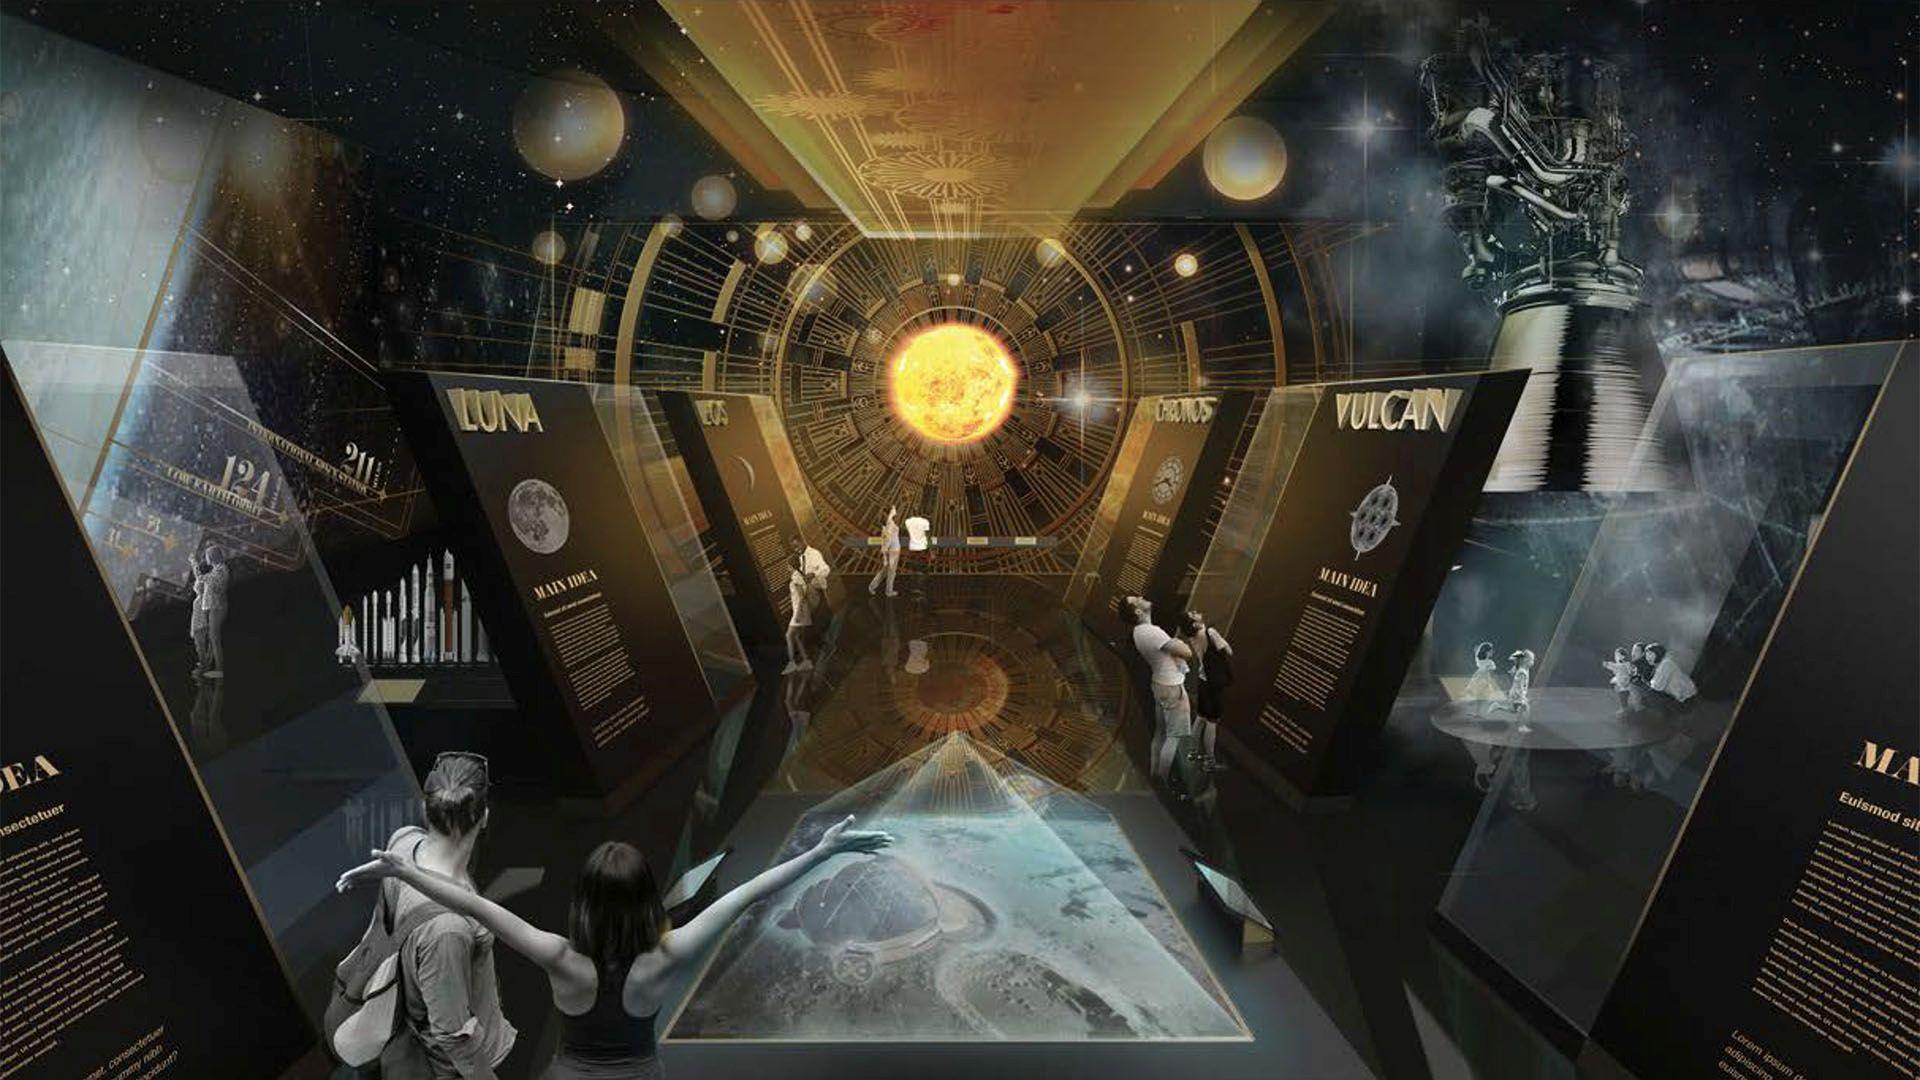 Helios - Exploring our Solar Neighborhood